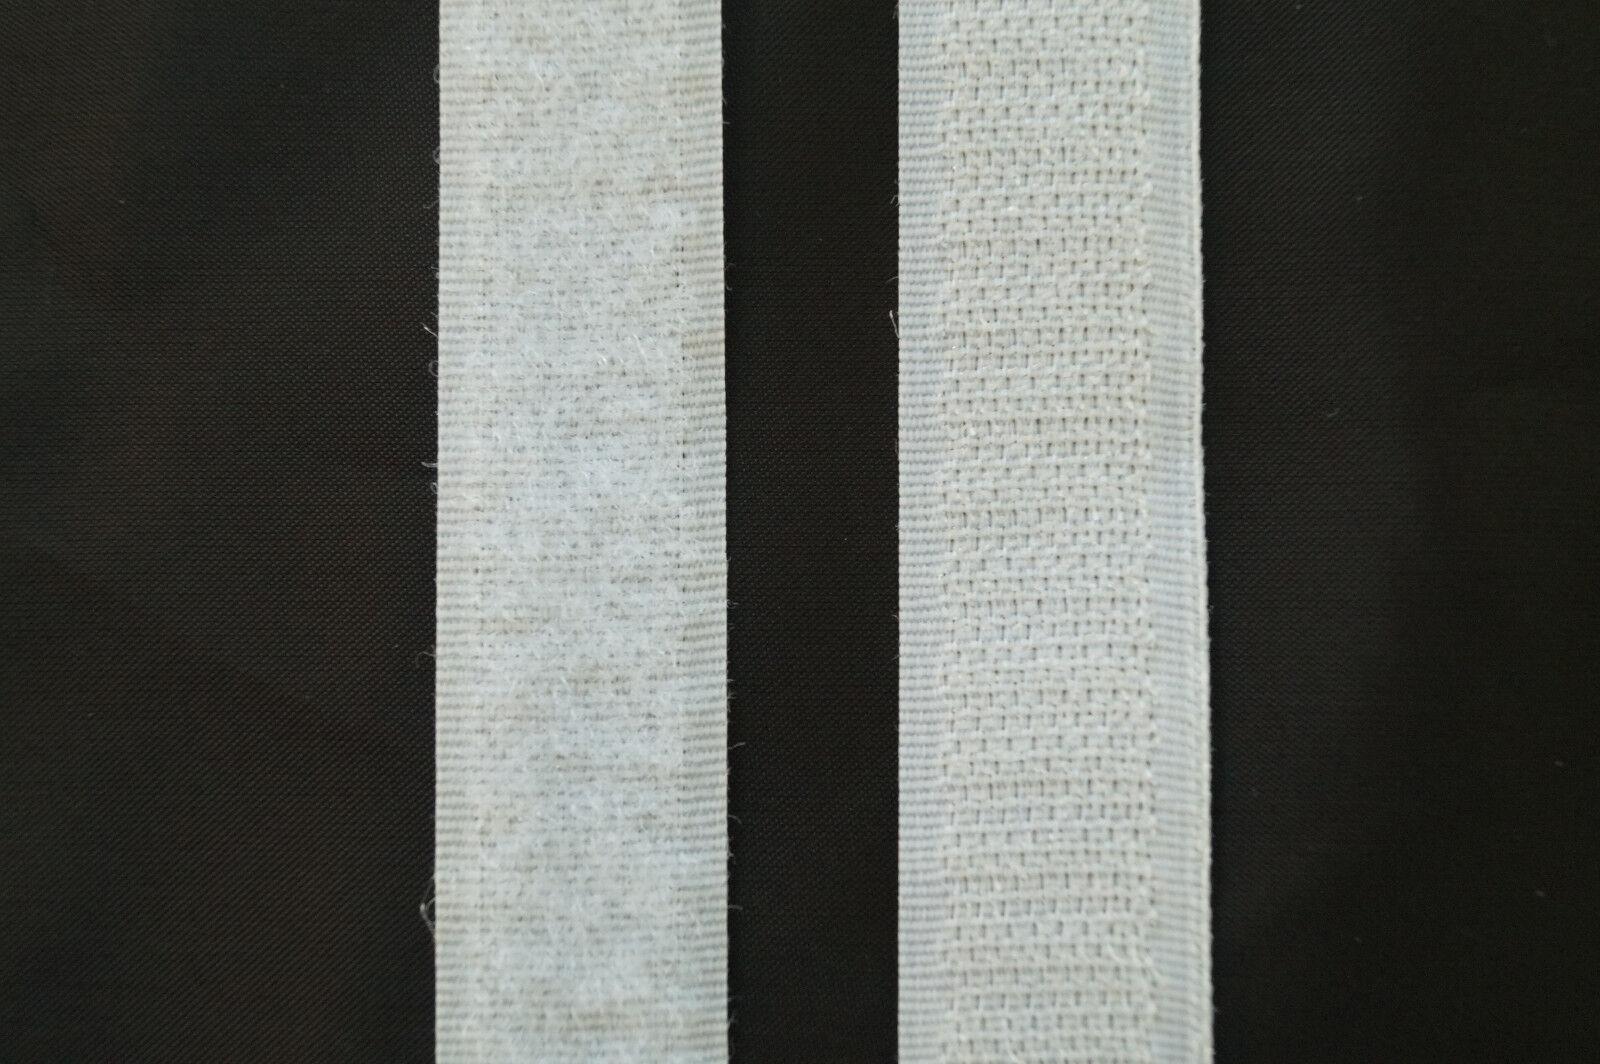 klettband hakenband inkl flauschband 20 mm breit. Black Bedroom Furniture Sets. Home Design Ideas